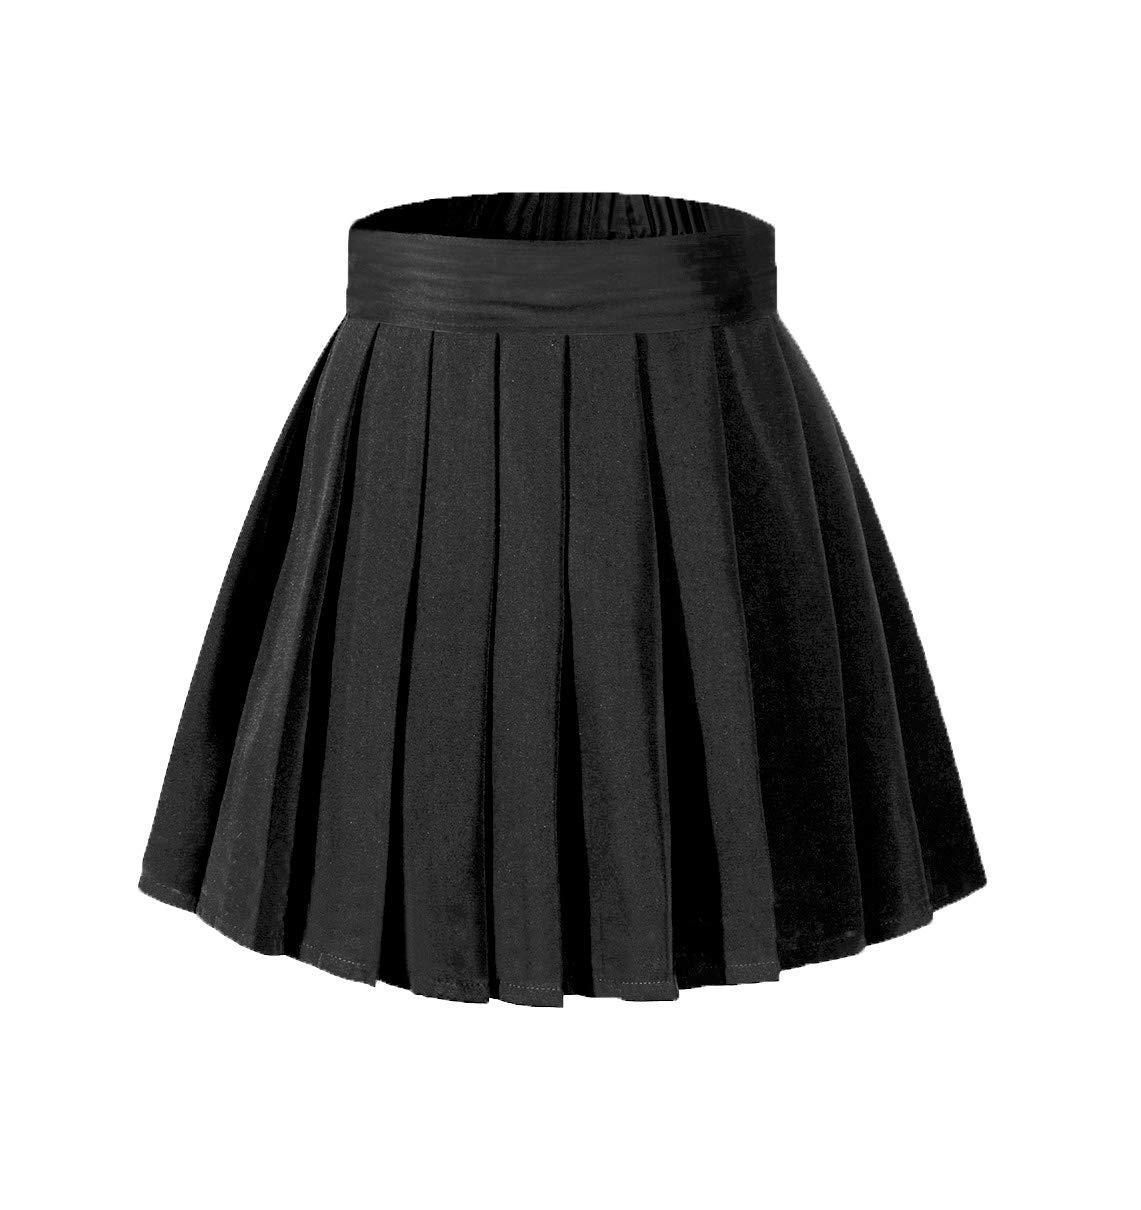 Beautifulfashionlife Girl's Black High Waist Ruffle Elastic Waistbands Skater Skirt with Shorts,S